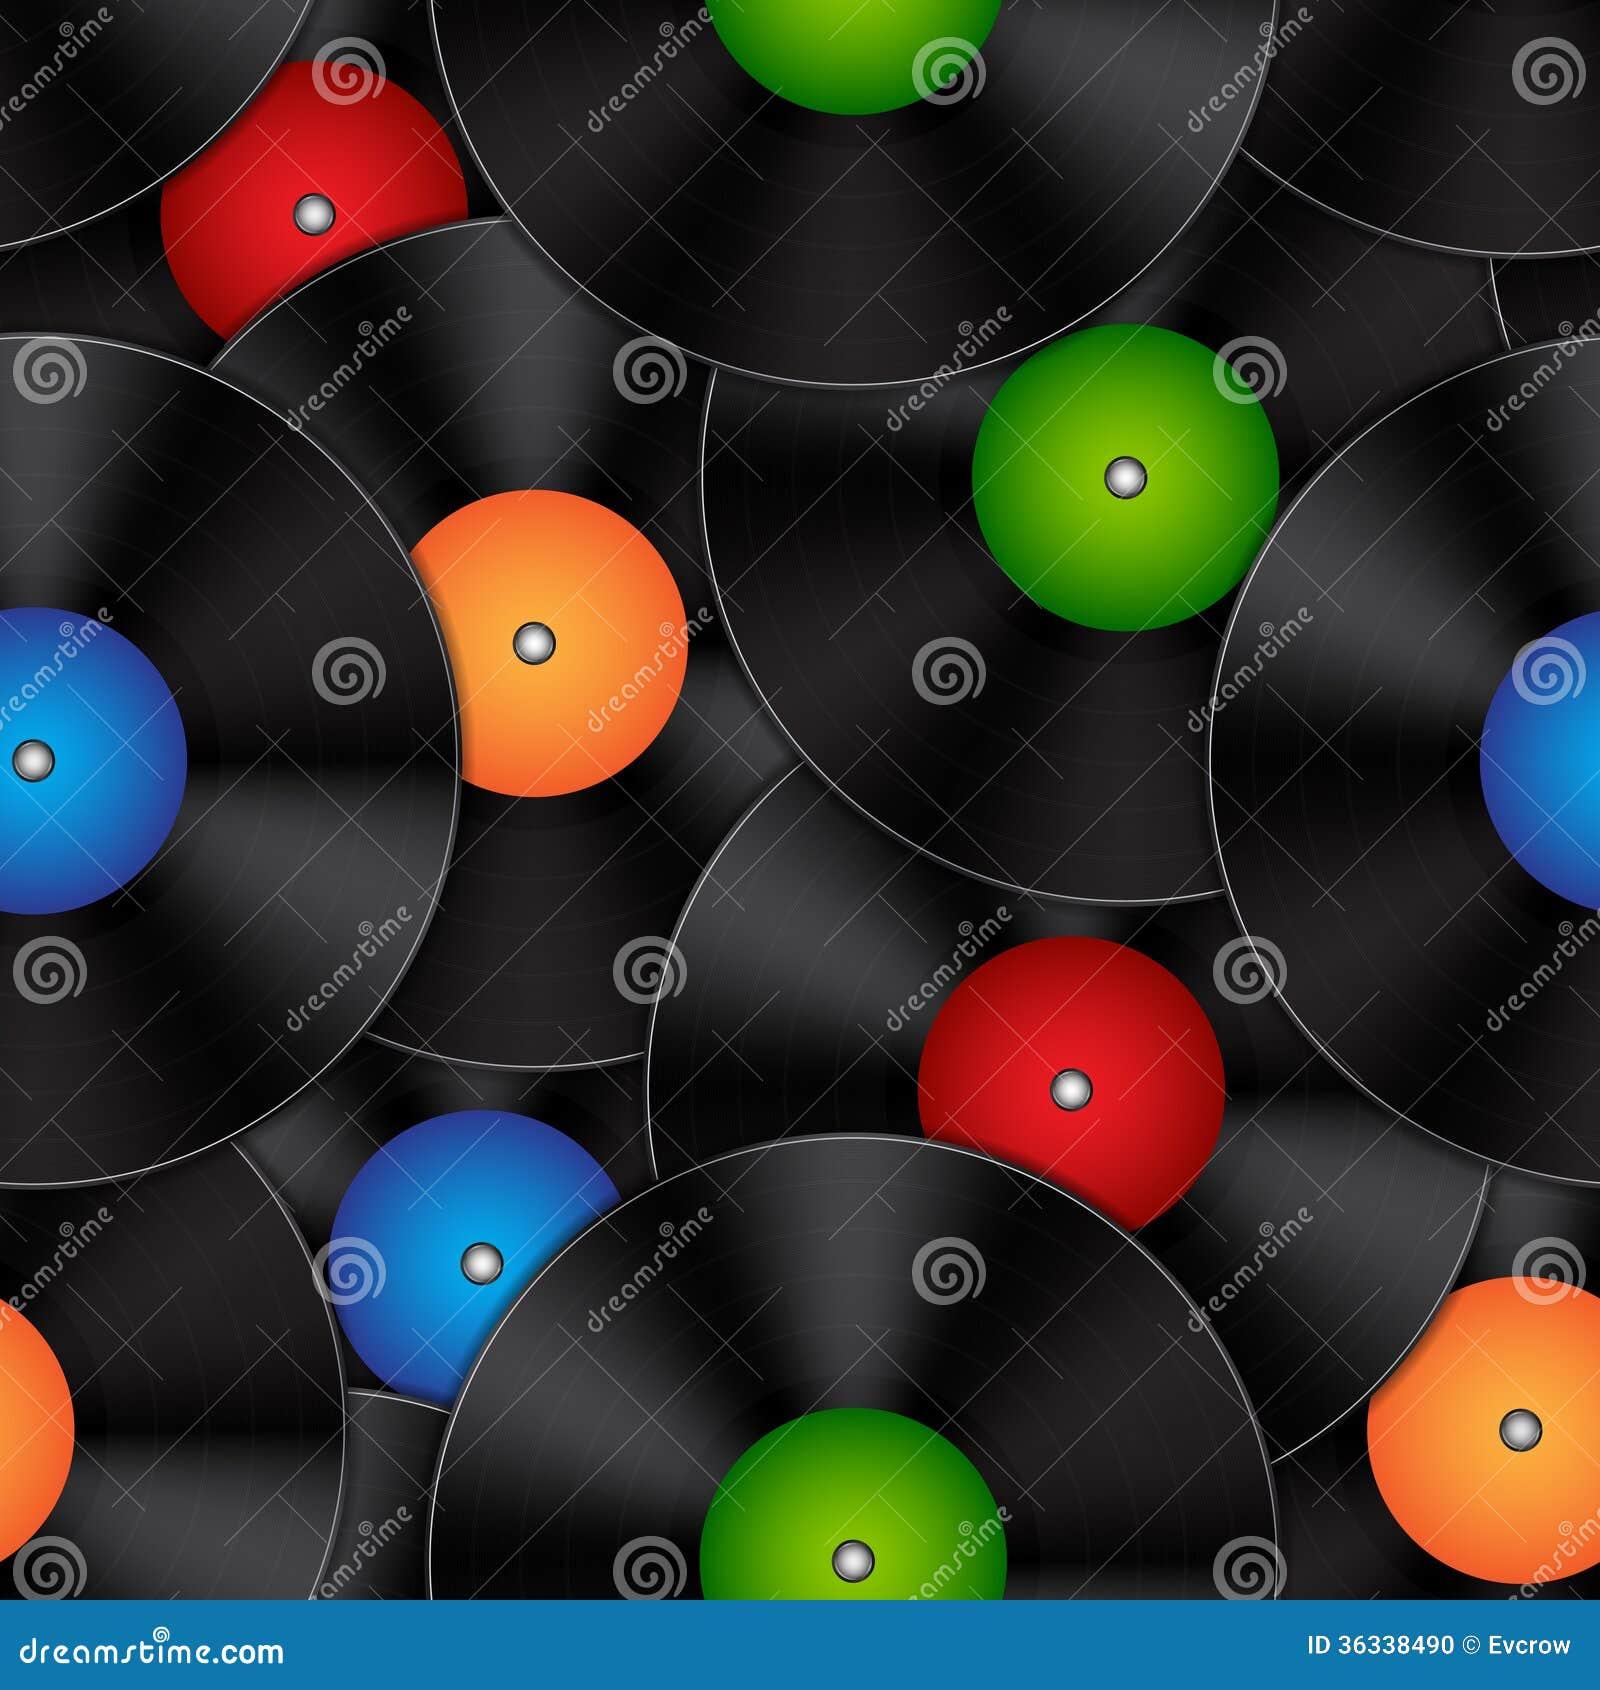 Background With Vinyl Records Stock Photo Image 36338490